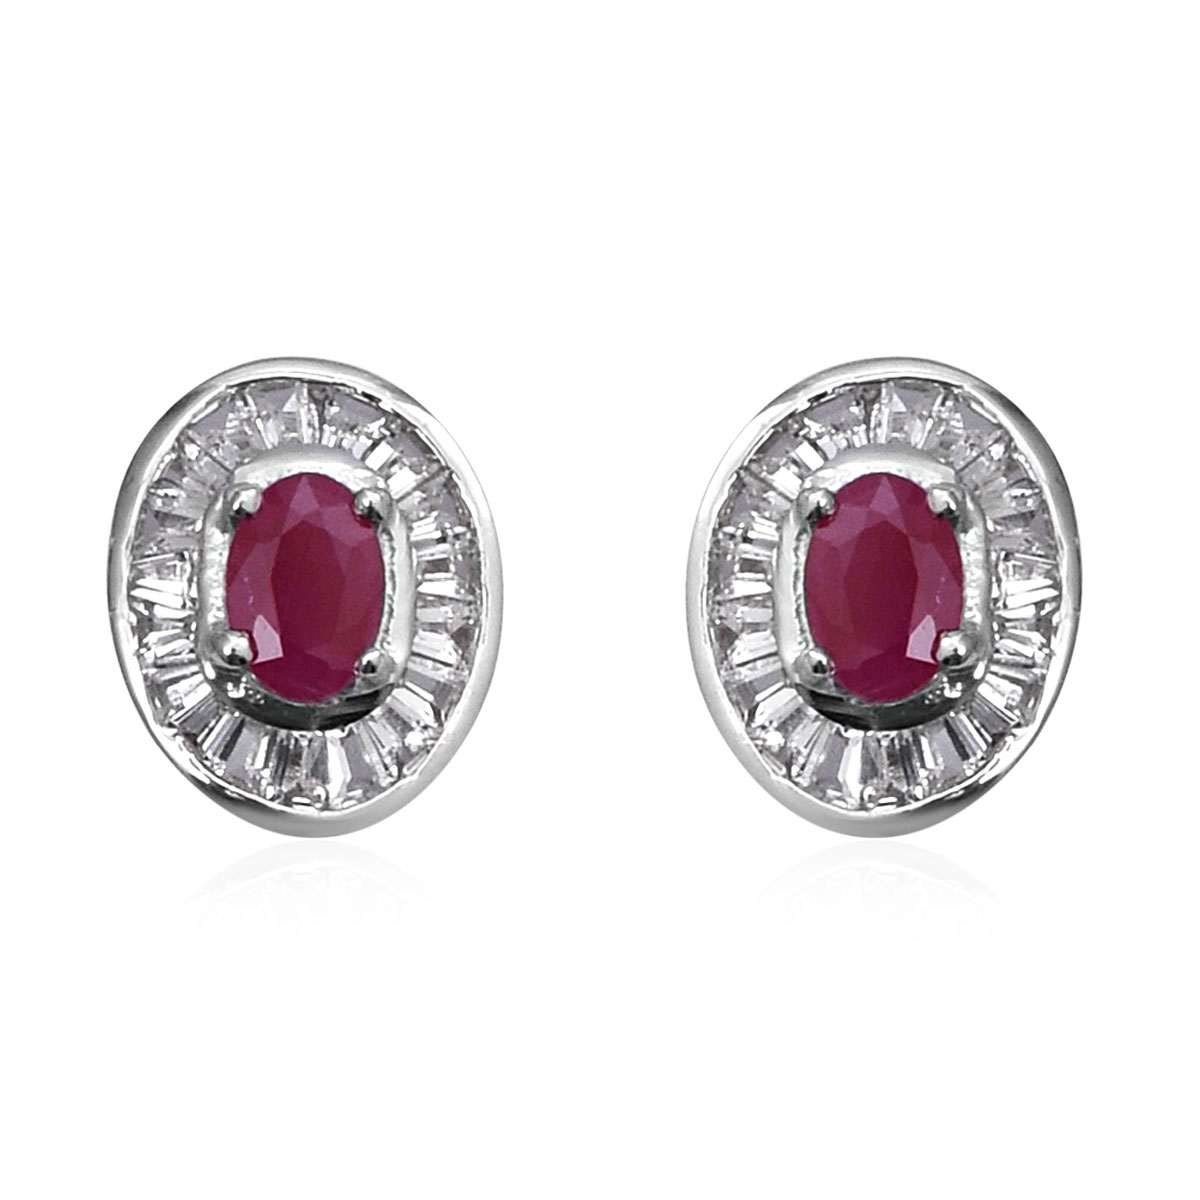 Burmese Ruby, White Topaz Stud Earrings in Platinum Over Sterling Silver 2.05 ctw